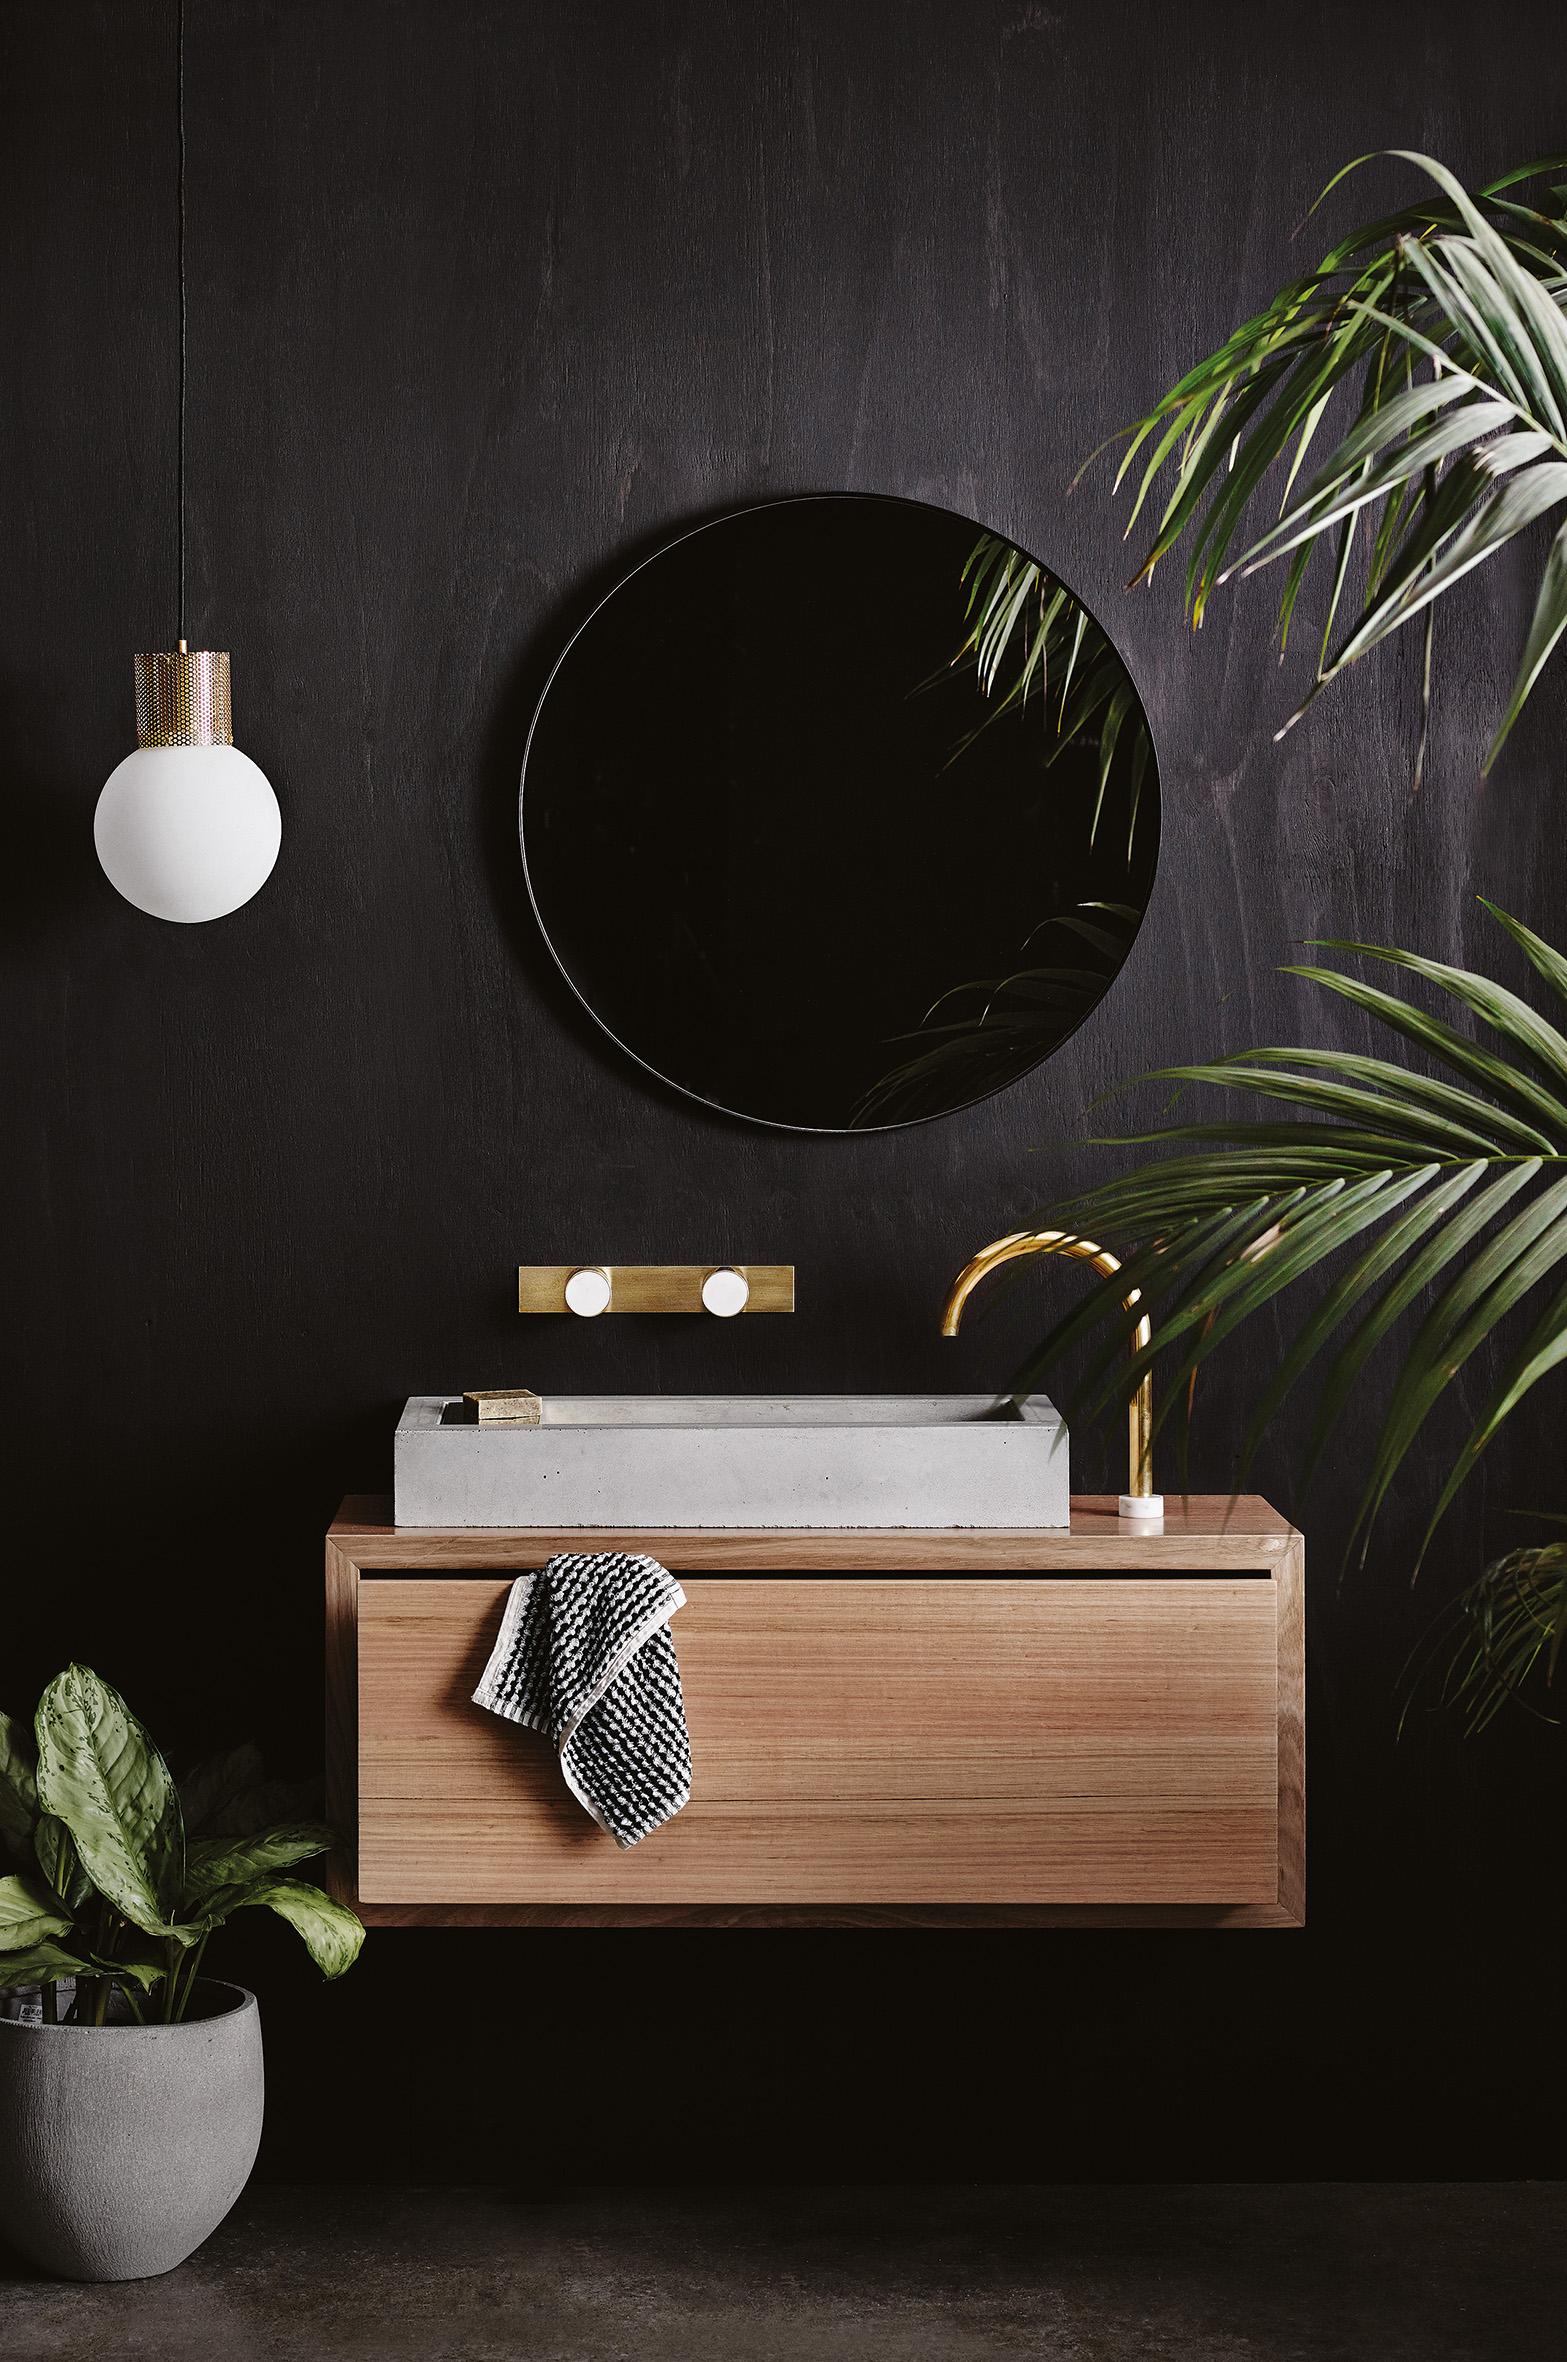 Wood Melbourne's concrete vanity basin  /   Photography  Lisa Cohen  /   Styling  Beck Simon